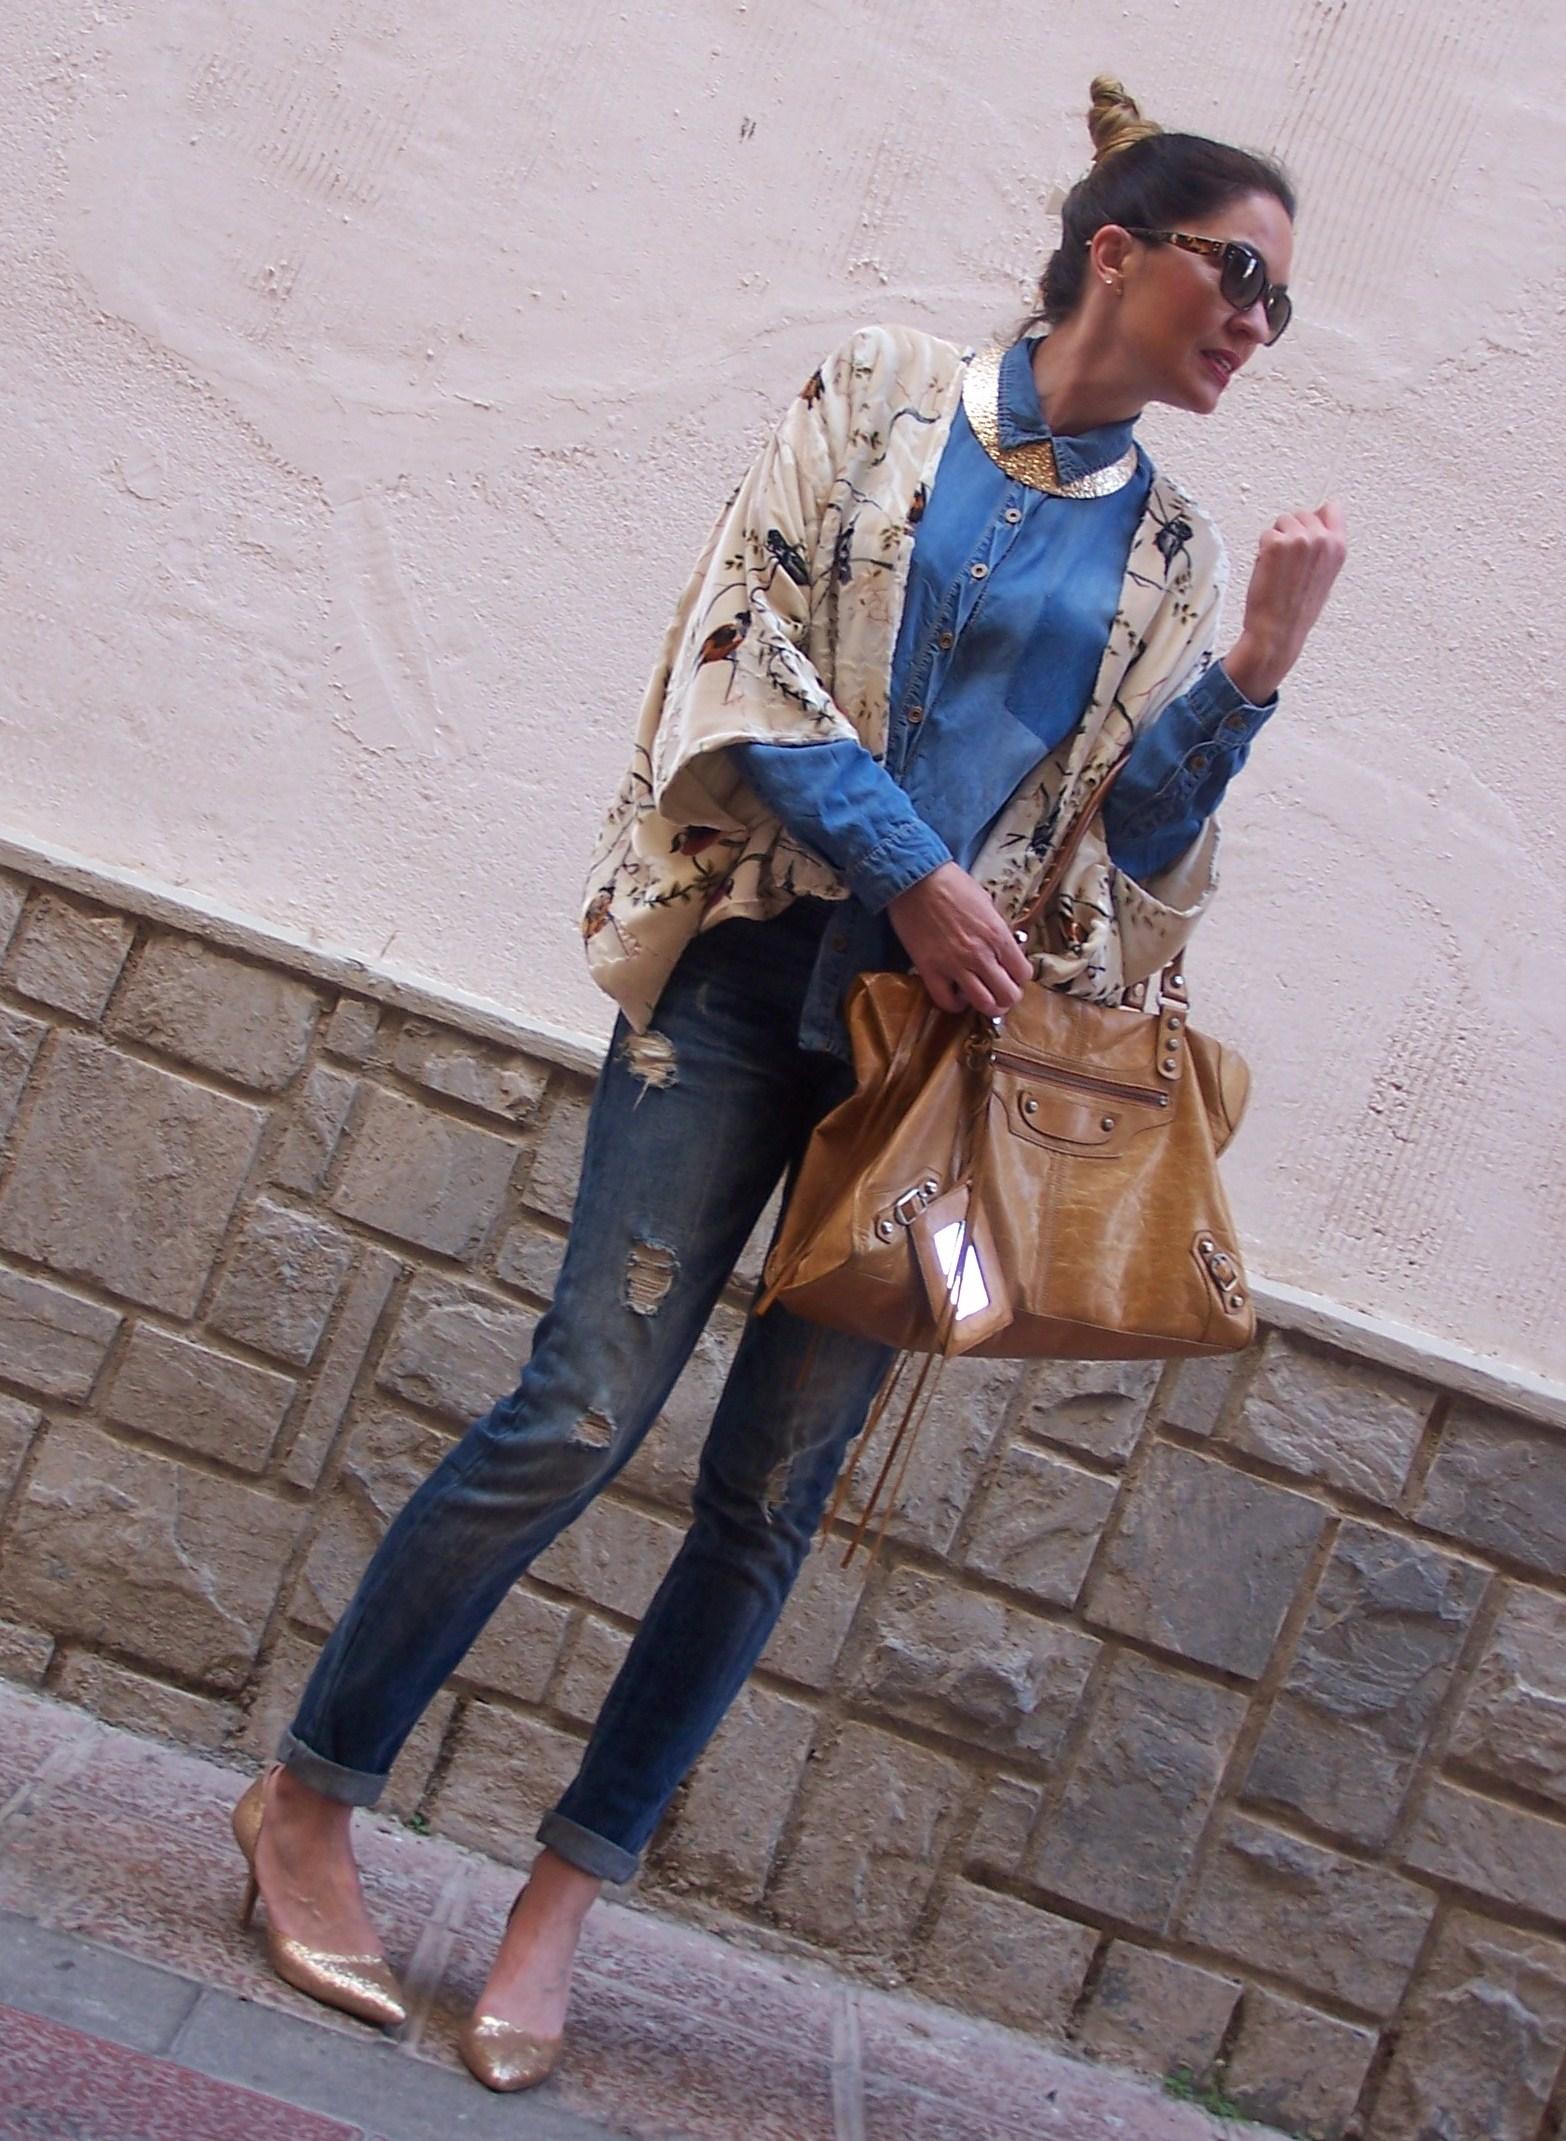 http://stylelovely.com/siguensiendodiosas/files/2013/03/103_13781.jpg